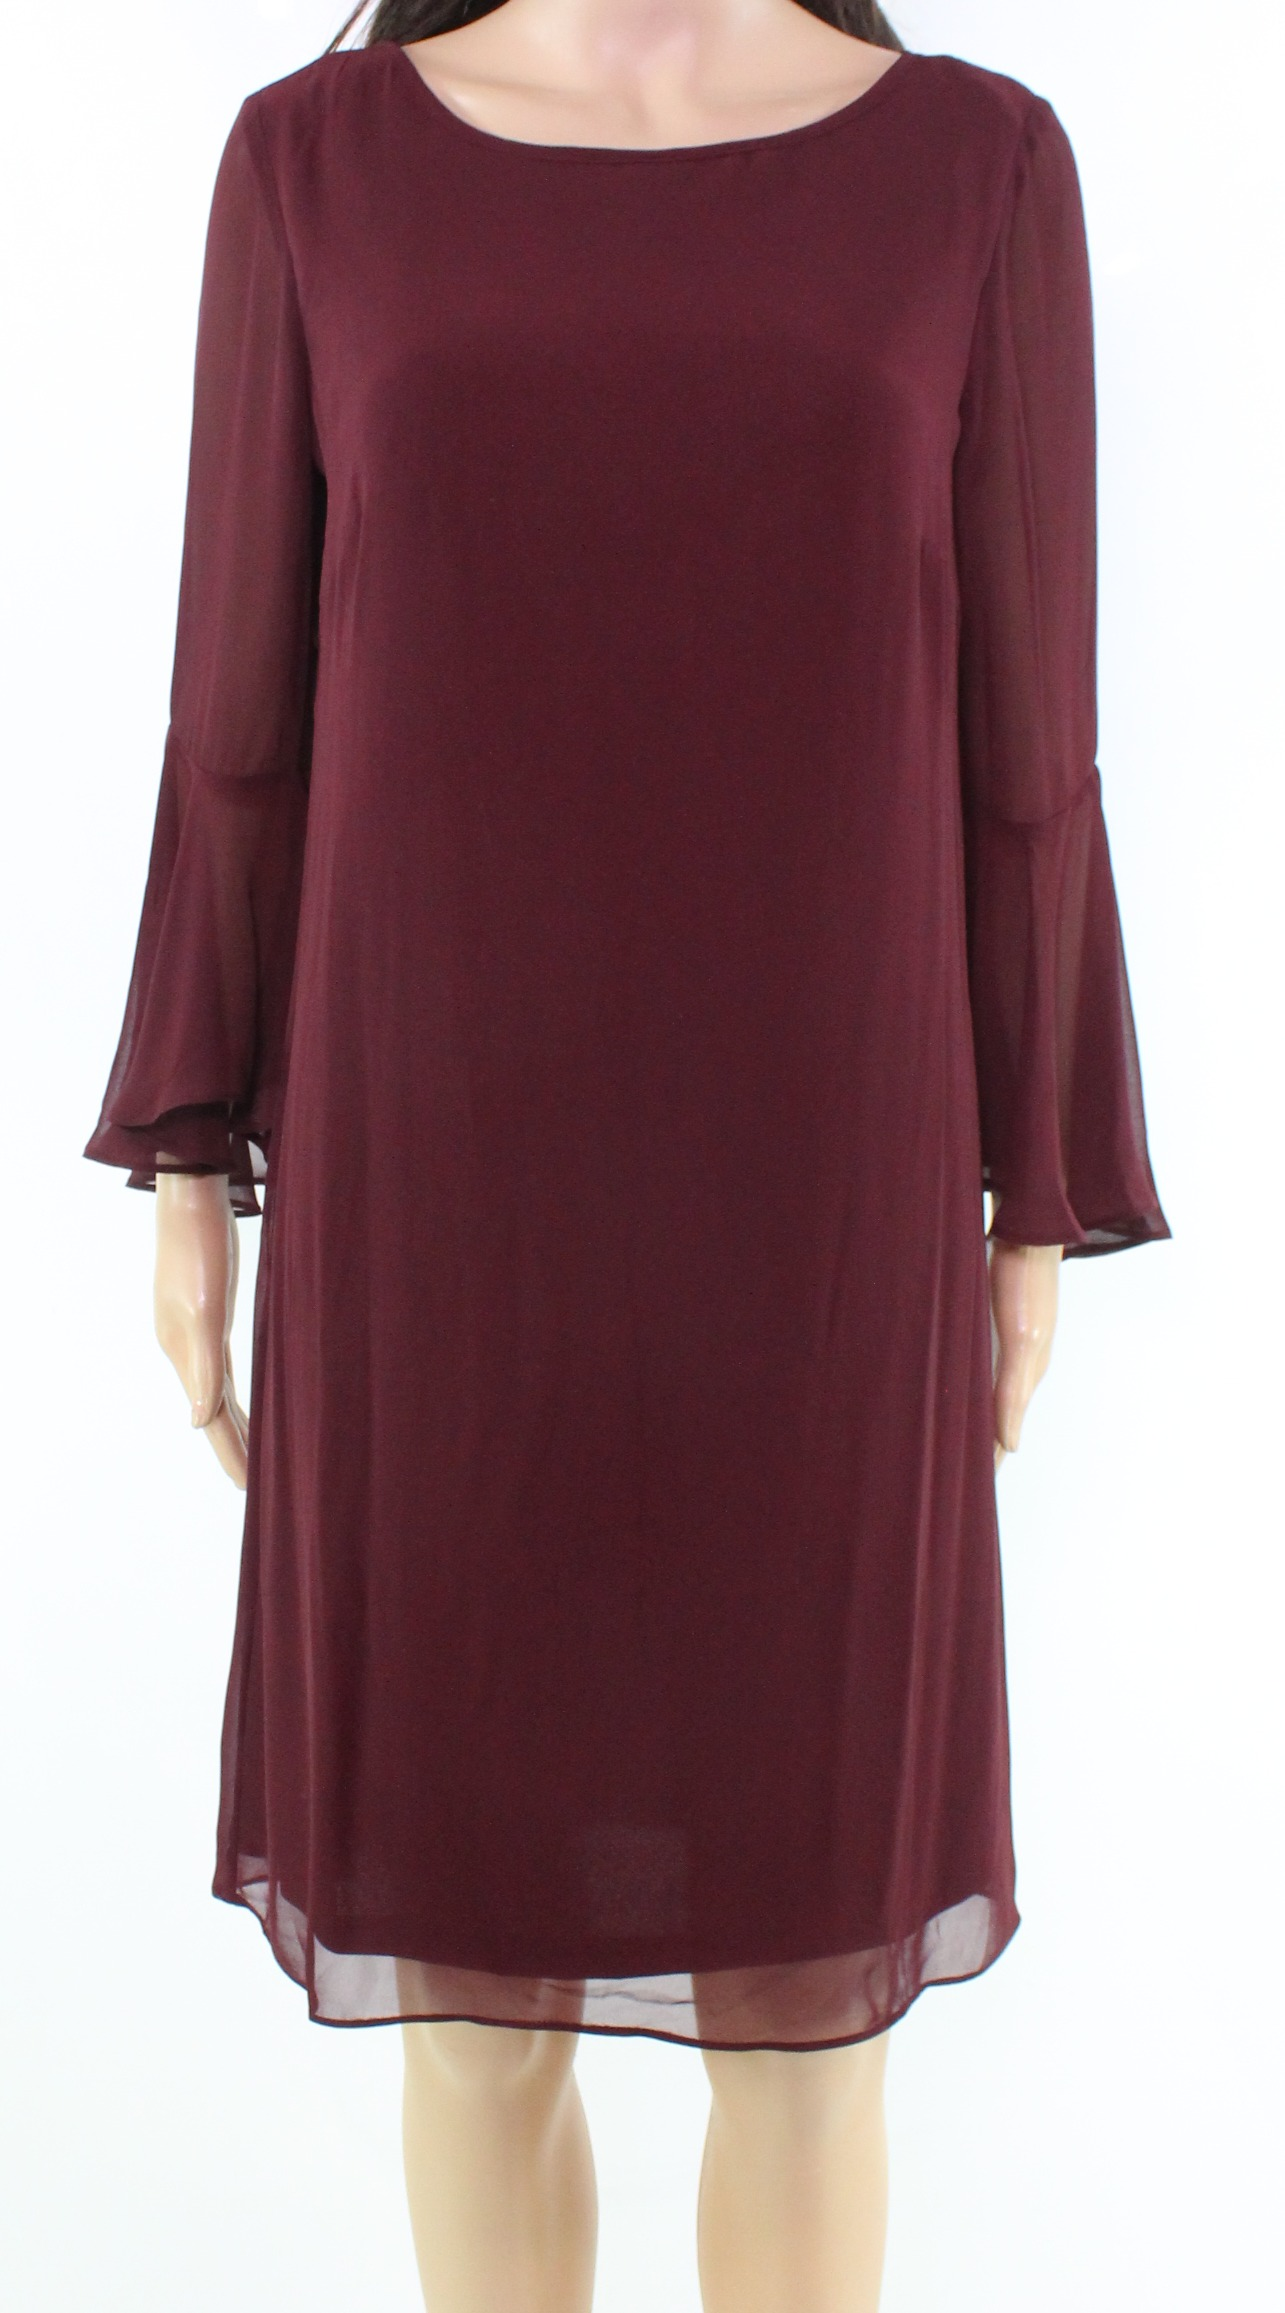 Inc New Red Port Bell Sleeve Womens Size 8 Chiffon Shift Dress